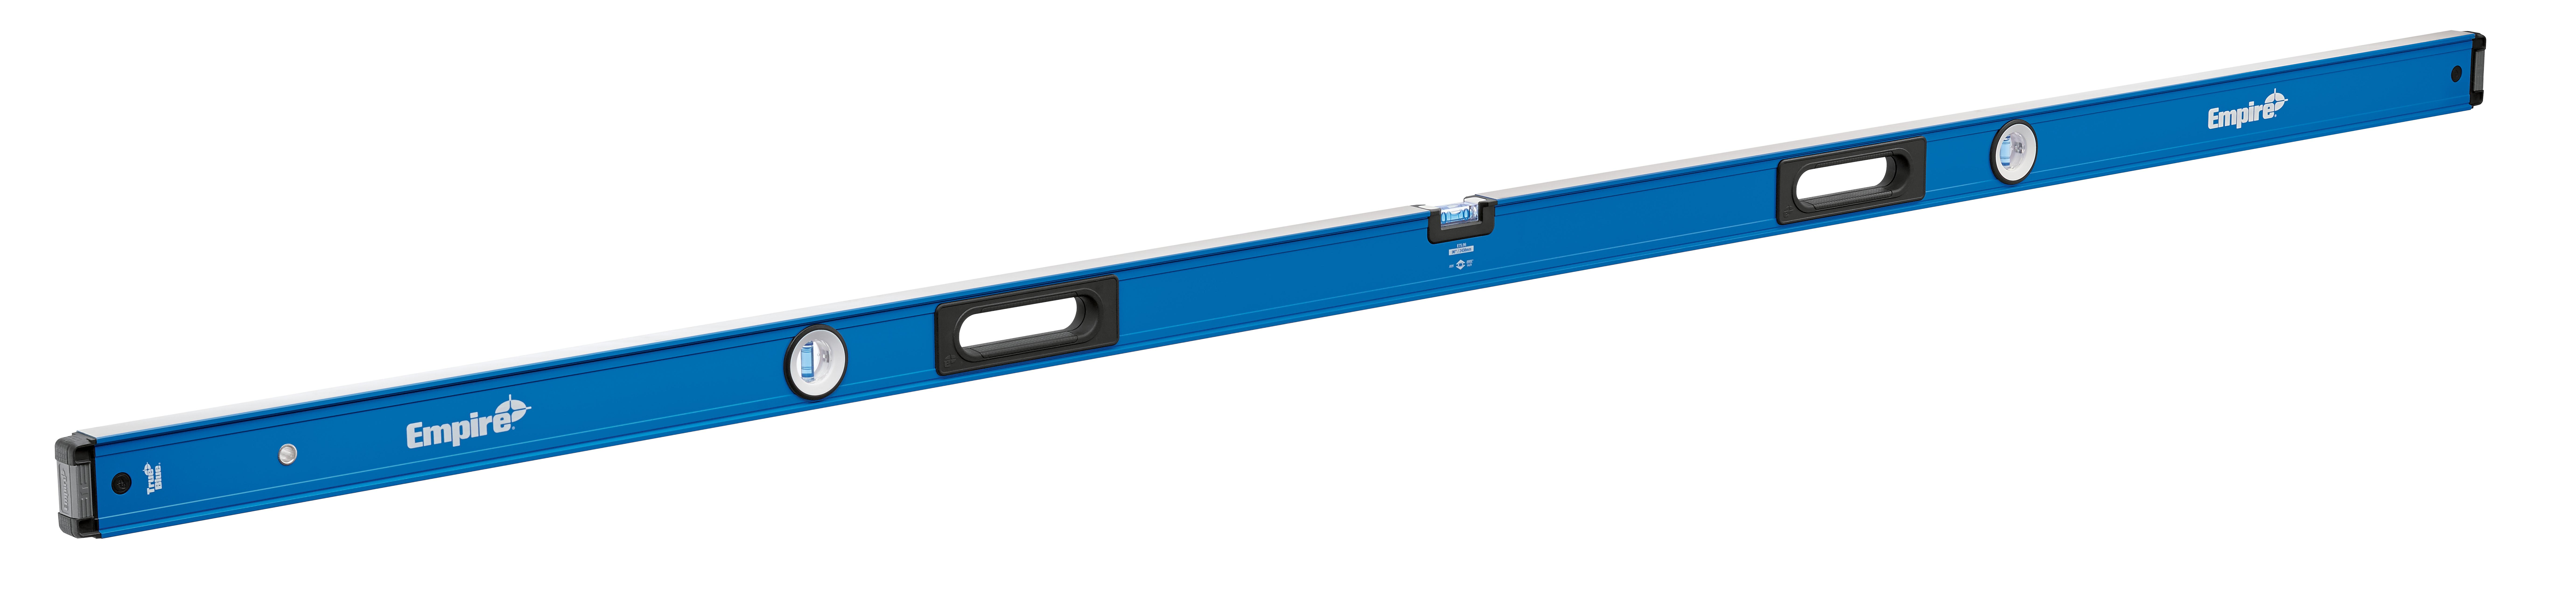 "96"" TRUE BLUE BOX LEVEL"